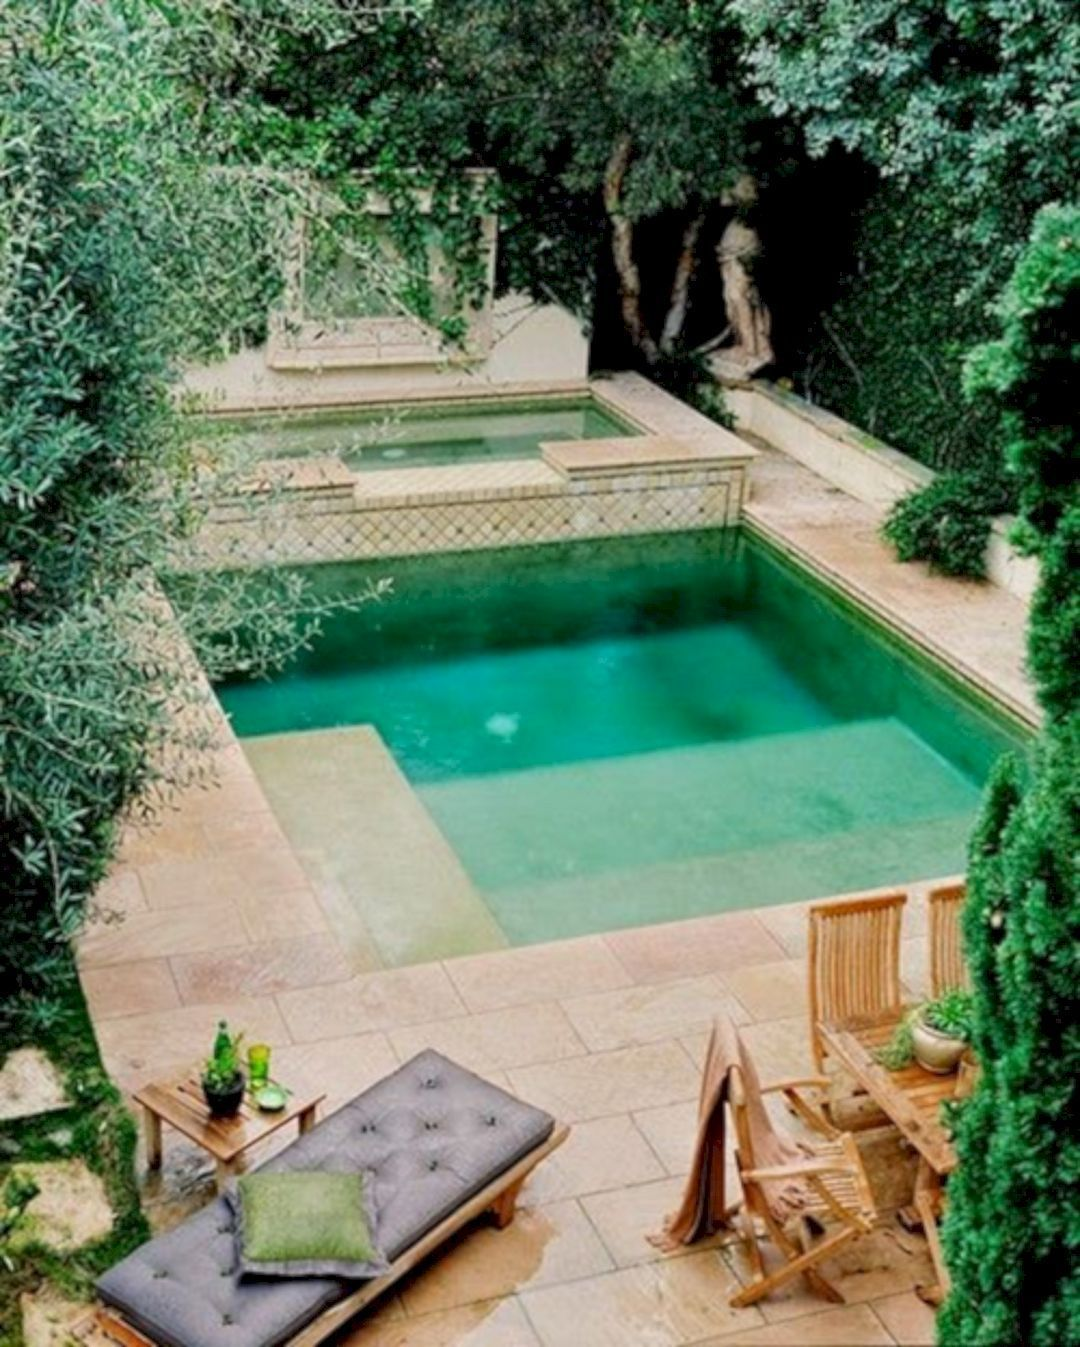 Medium Of Coolest Backyard Pools